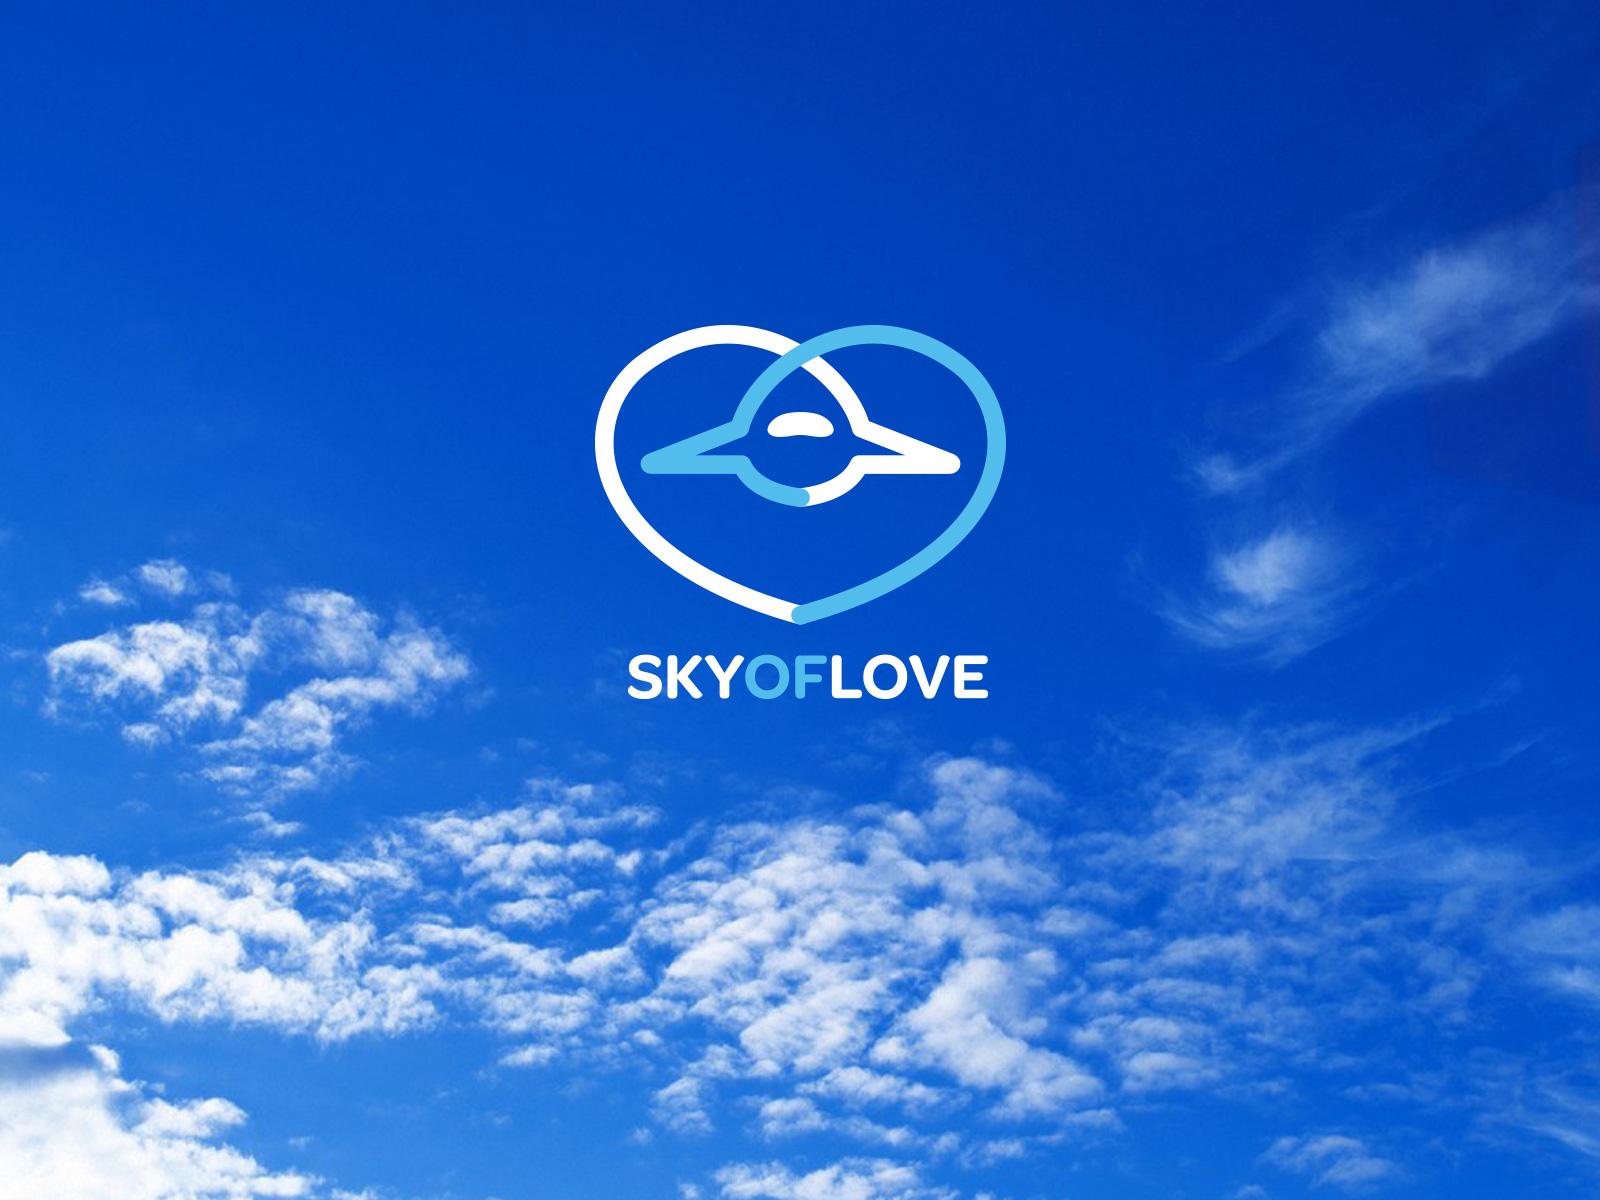 Sky Of Love pro bono logo design